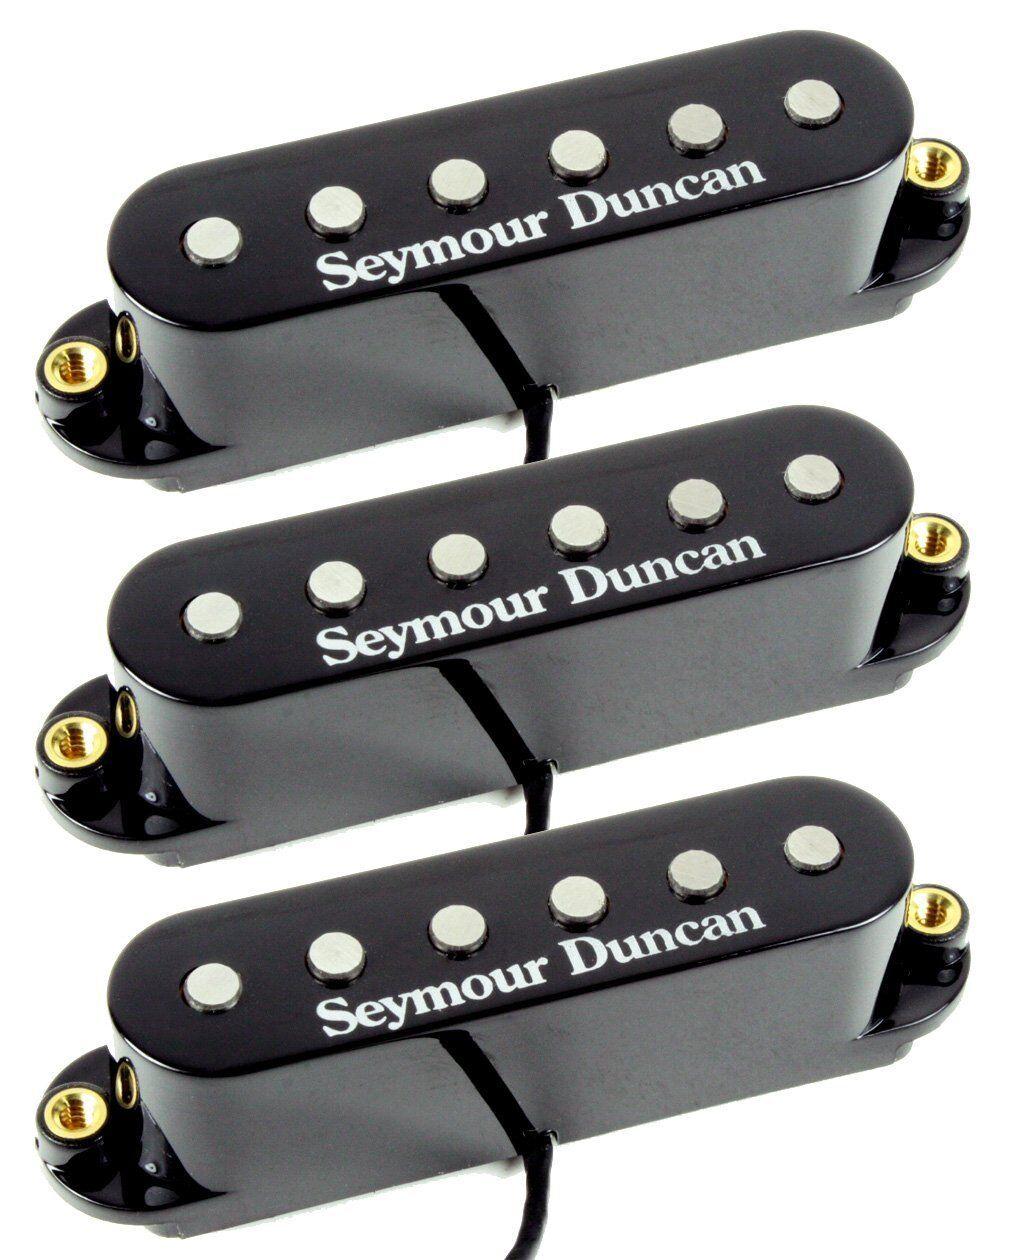 Ybriefbag-Musica Accessories Full Set Tune VOL Control Classical Guitar Pickup Lyric Acoustic Guitar Microphone for Acoustic Folk Classic Guitar Microphone Pickup Color : Black, Size : Free Size